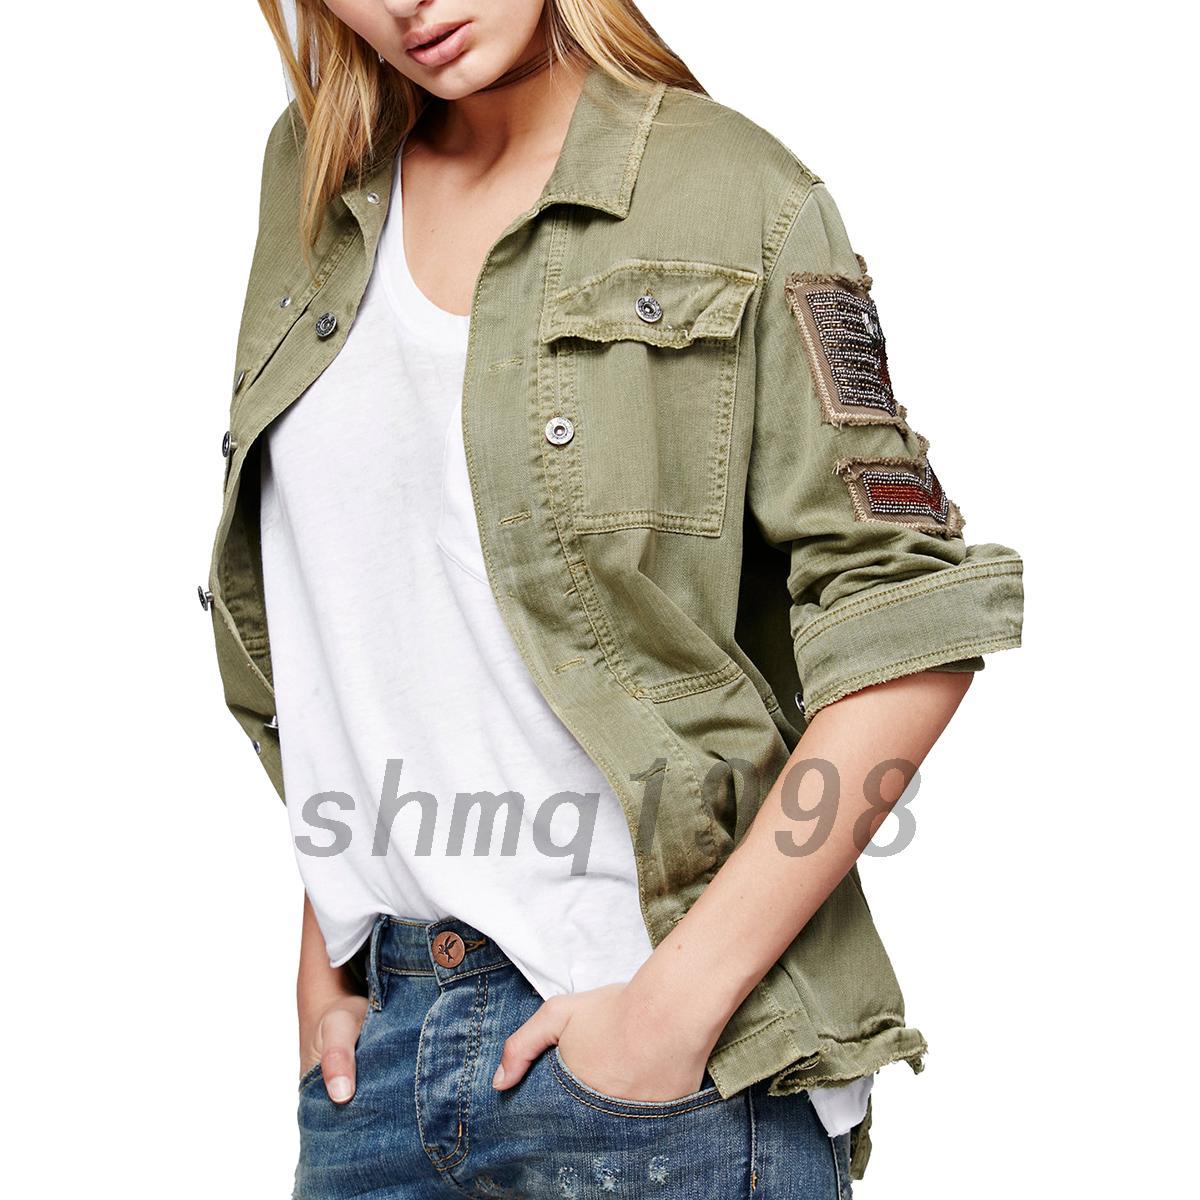 blouson en jean femme veste demi saison coton denim chemise grande taille ebay. Black Bedroom Furniture Sets. Home Design Ideas